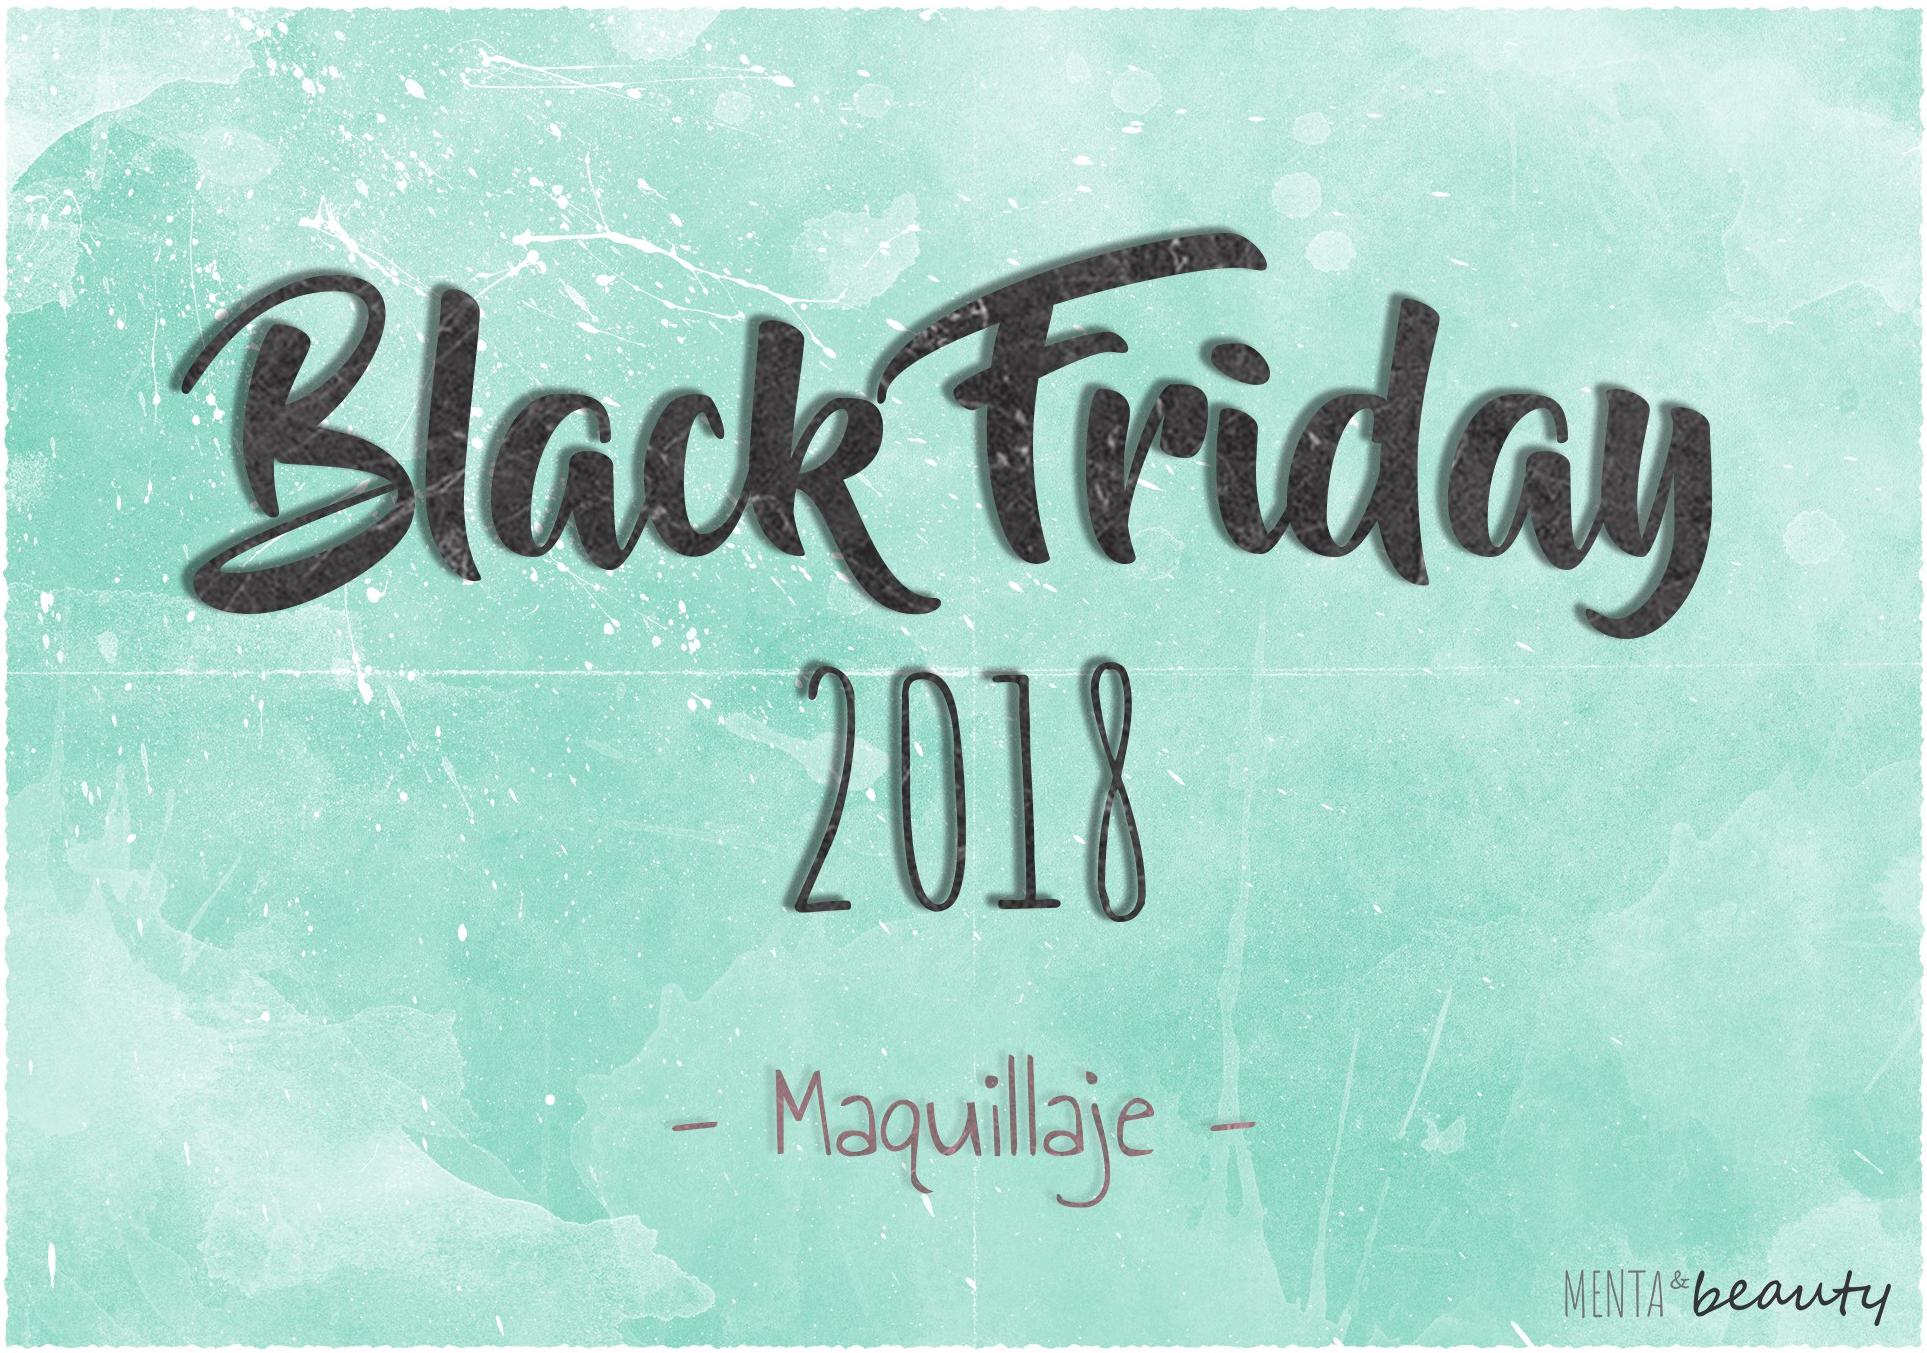 blackfriday_2018_maquillaje-copia.jpg